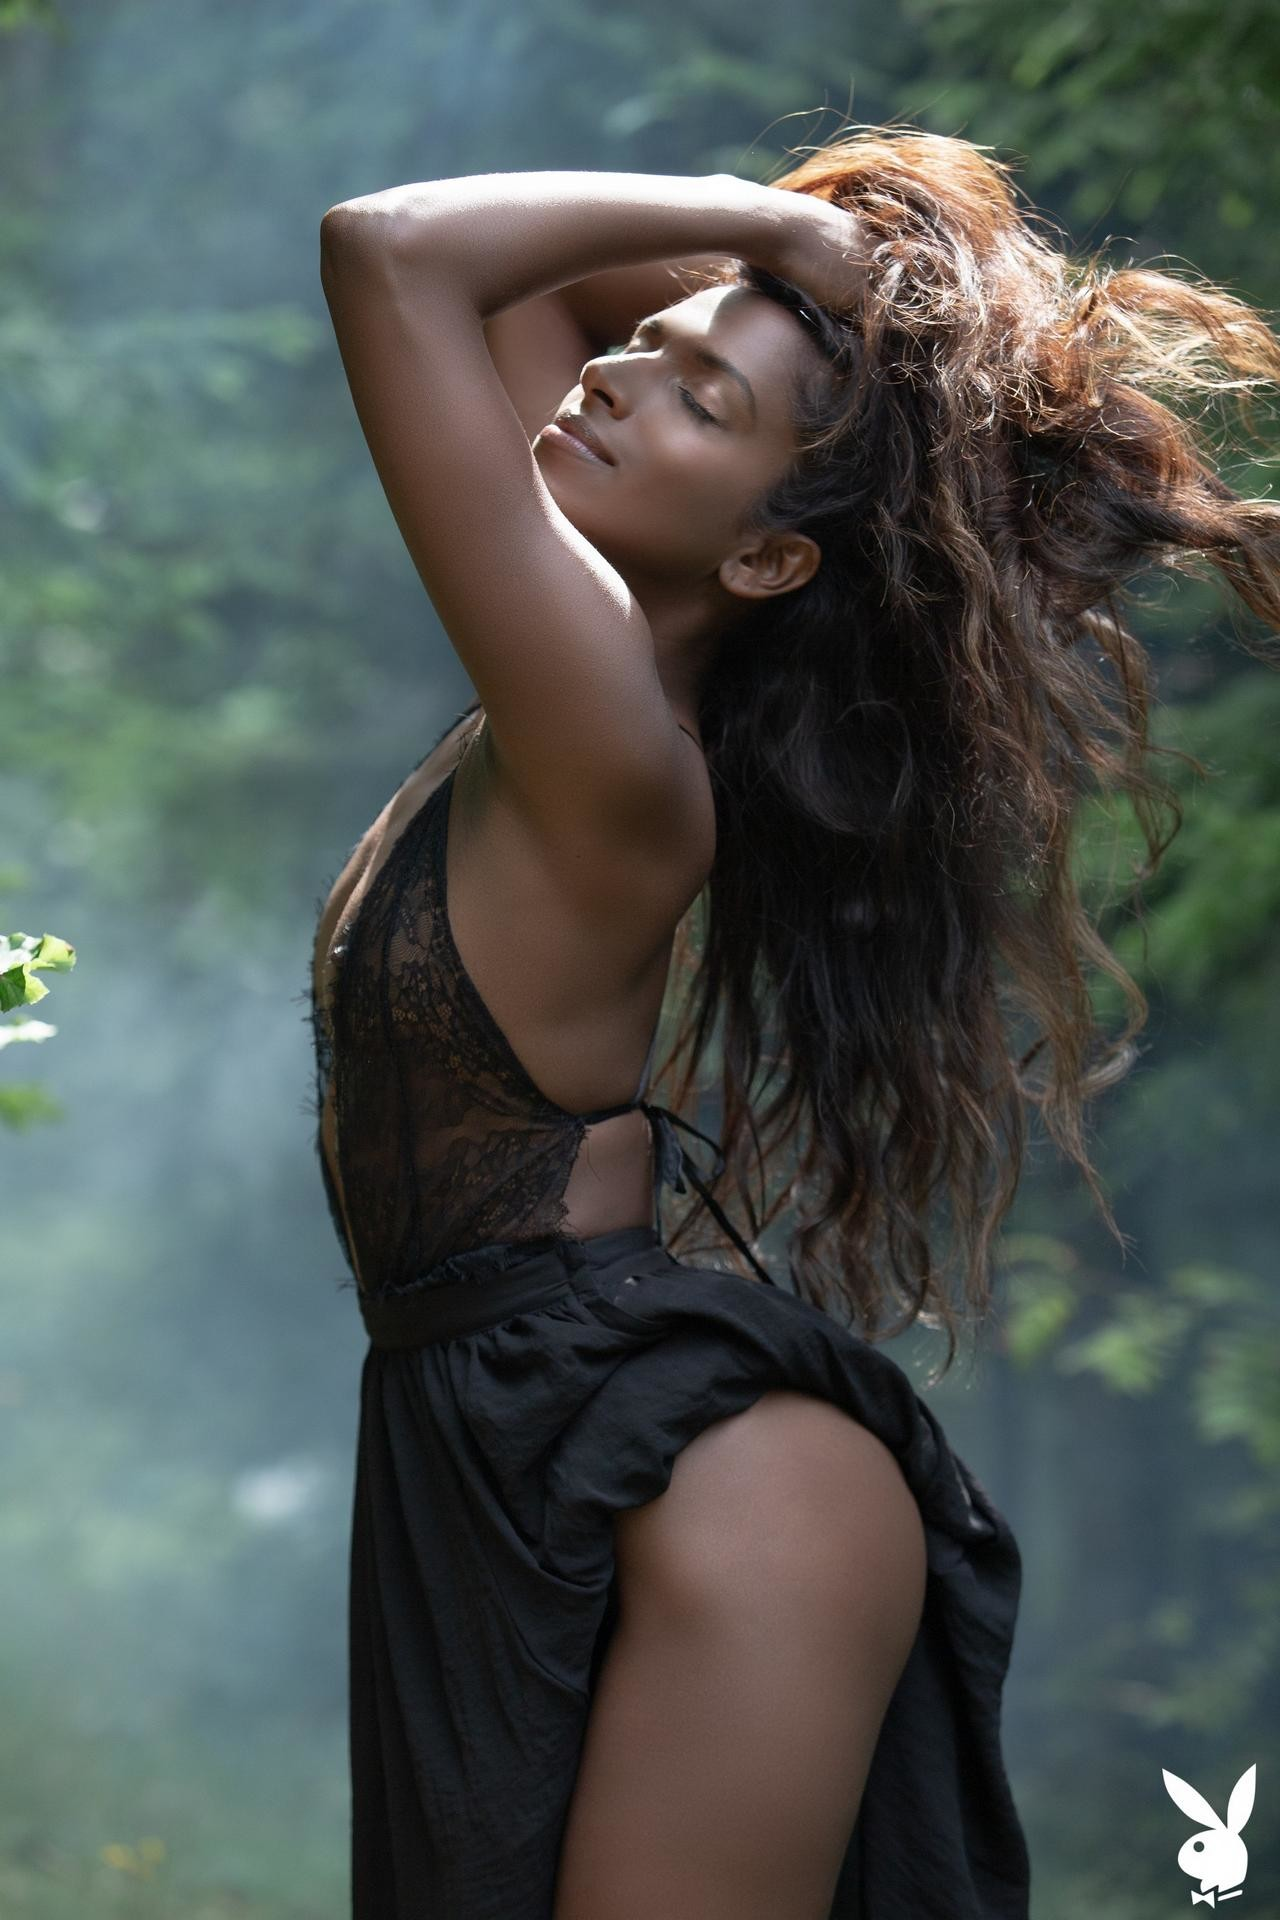 Angel Constance, Jasmine Jazz, Kay J, Miss Zita, Nirmala Fernandes (21)